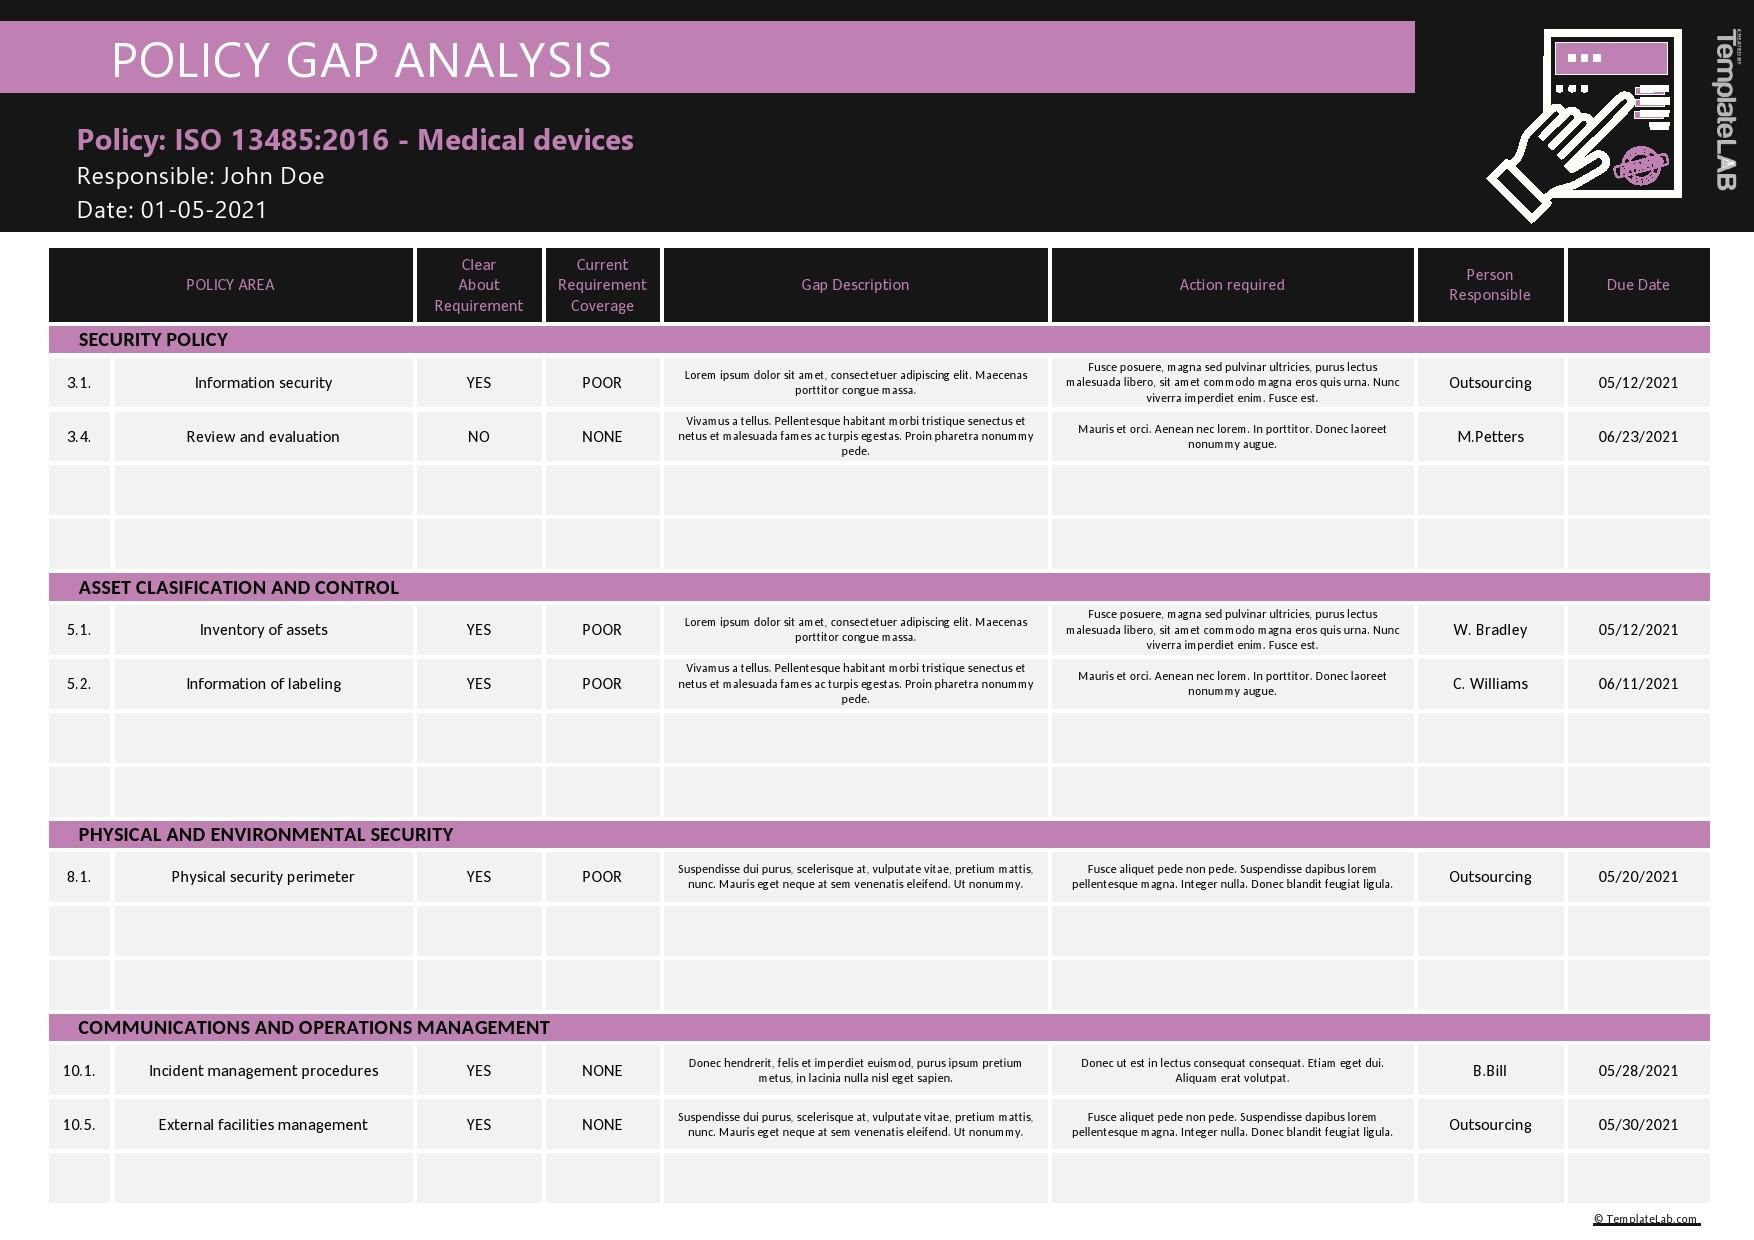 Free Policy Gap Analysis Template - TemplateLab.com